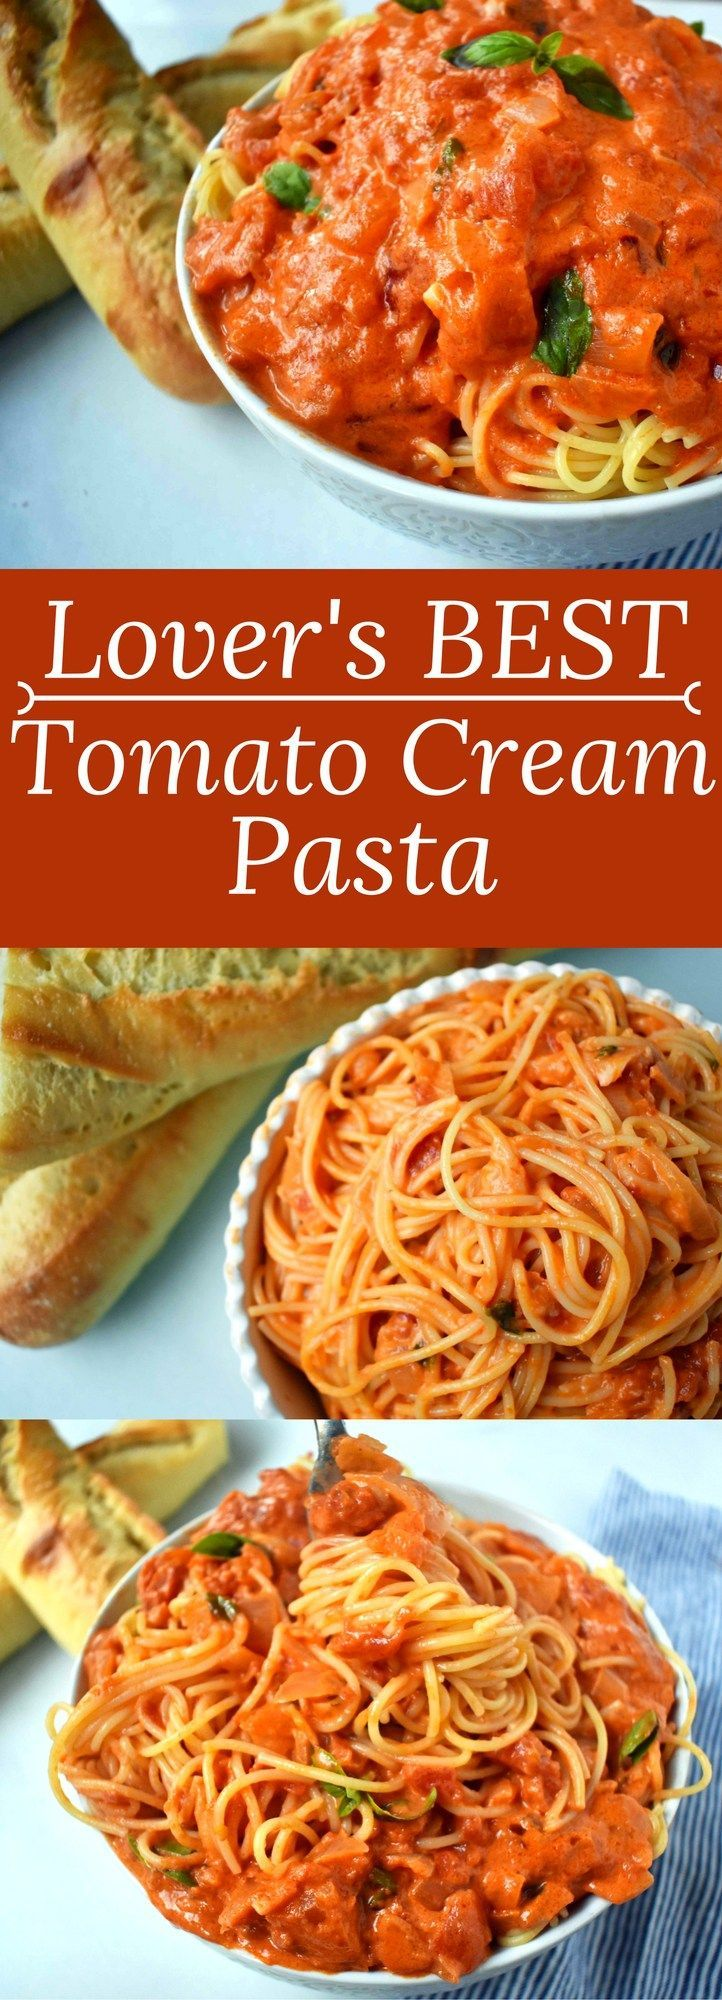 Lover's BEST EVER Tomato Cream Pasta. Homemade marinara sauce with cream and fresh basil. www.modernhoney.com